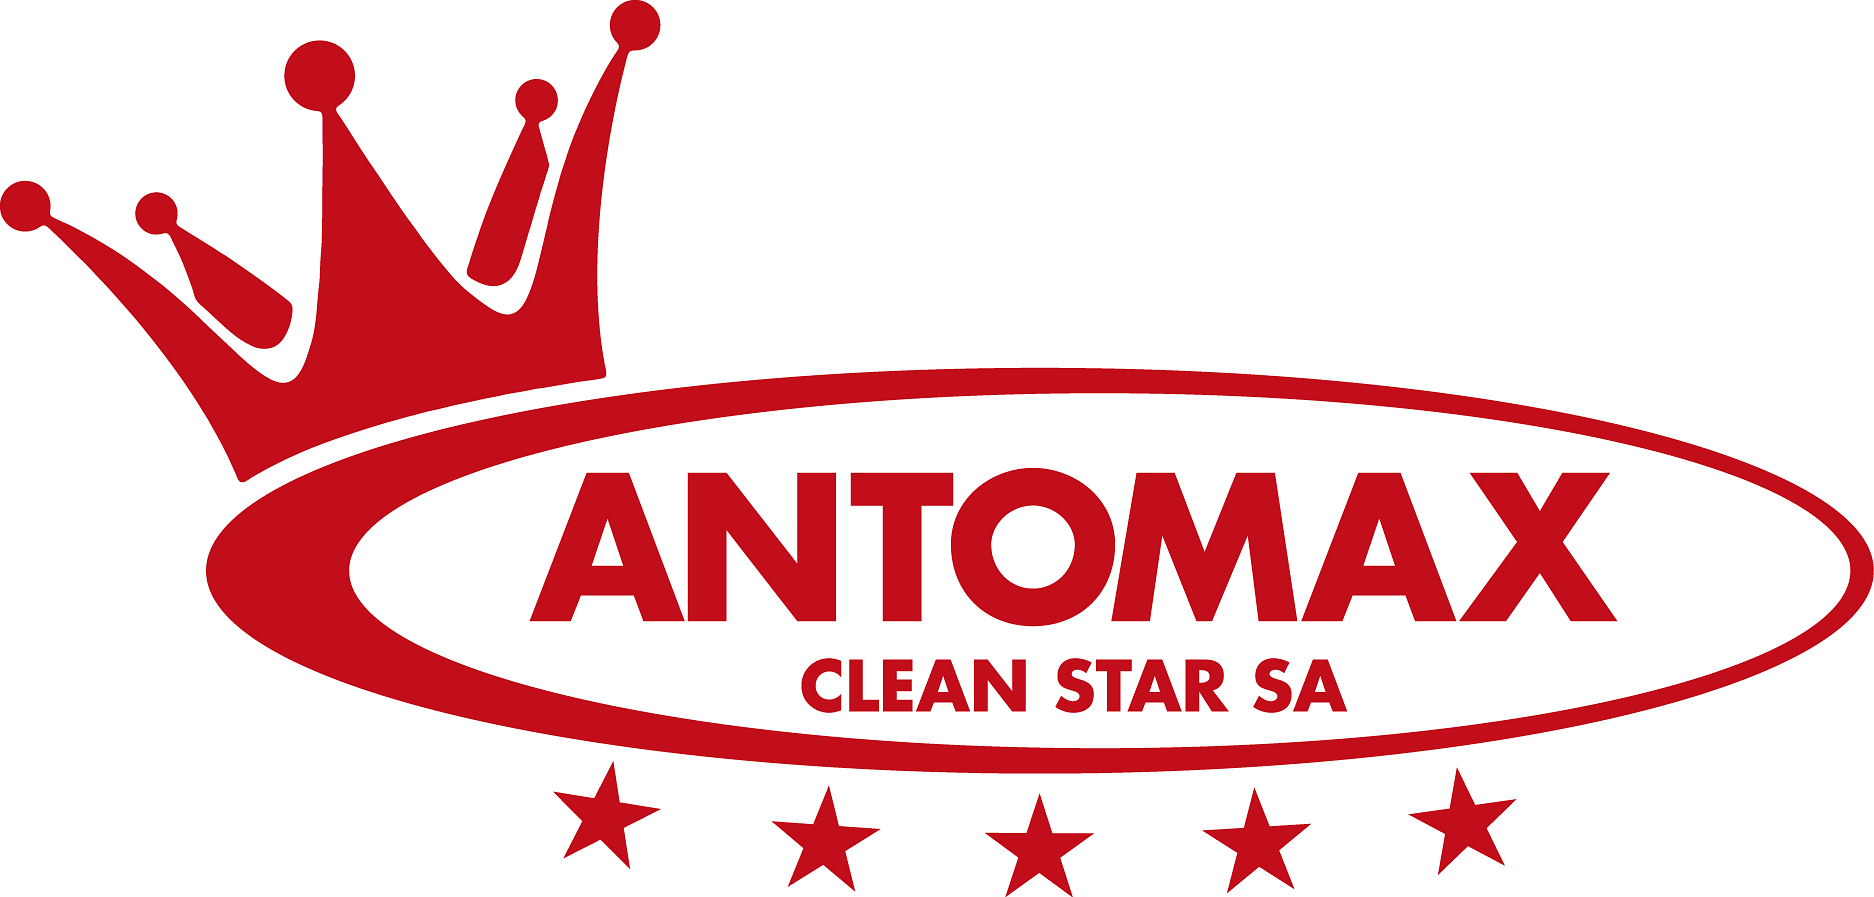 ANTOMAX CLEAN STAR SA